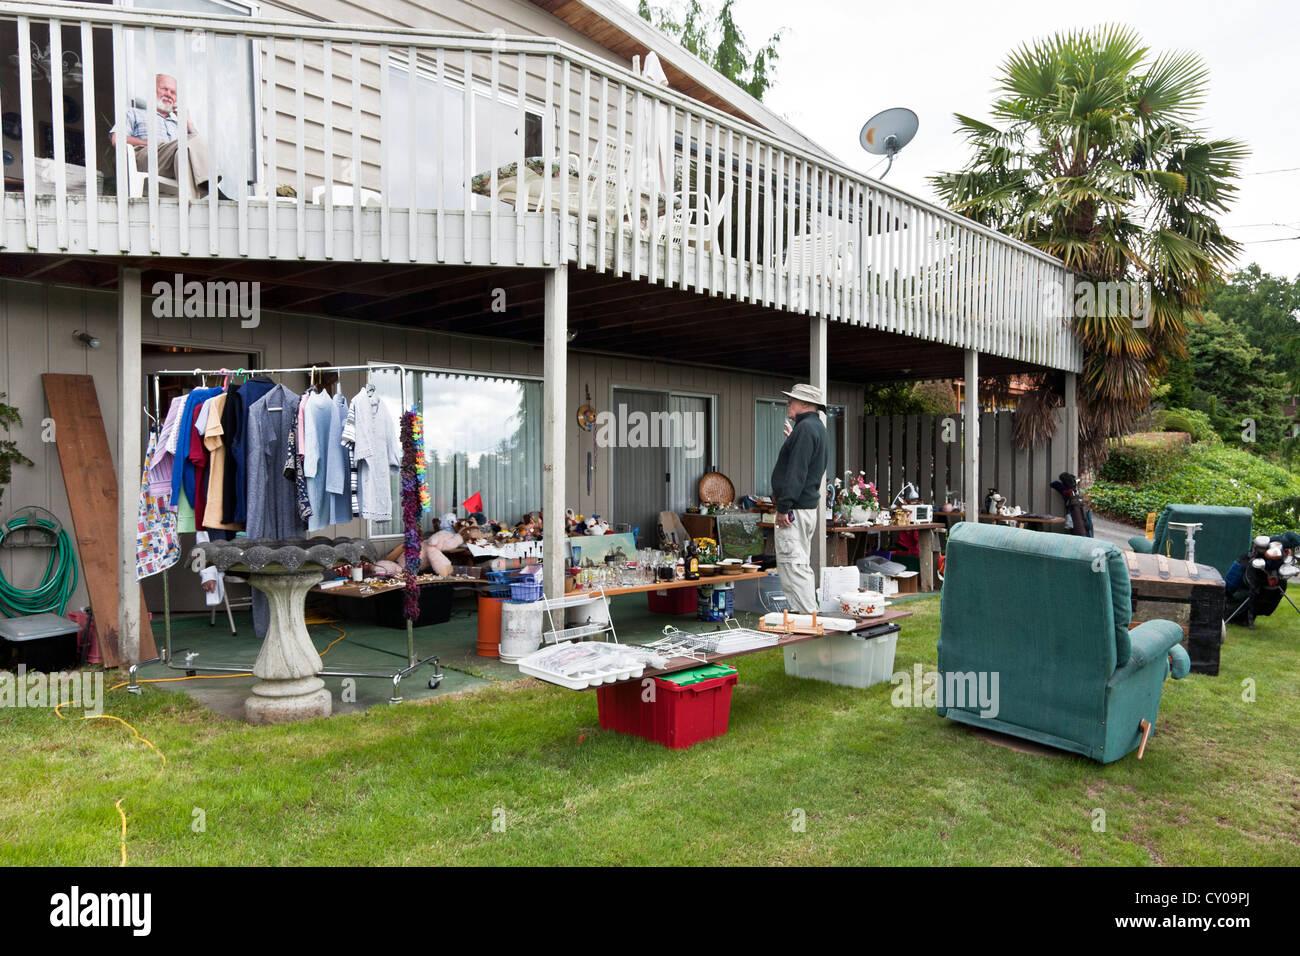 Senior Man Checks Out Display Of Furniture Bric A Brac Kitsch At Yard  Garage Sale On Lawn Neat Suburban House Edmonds Washington